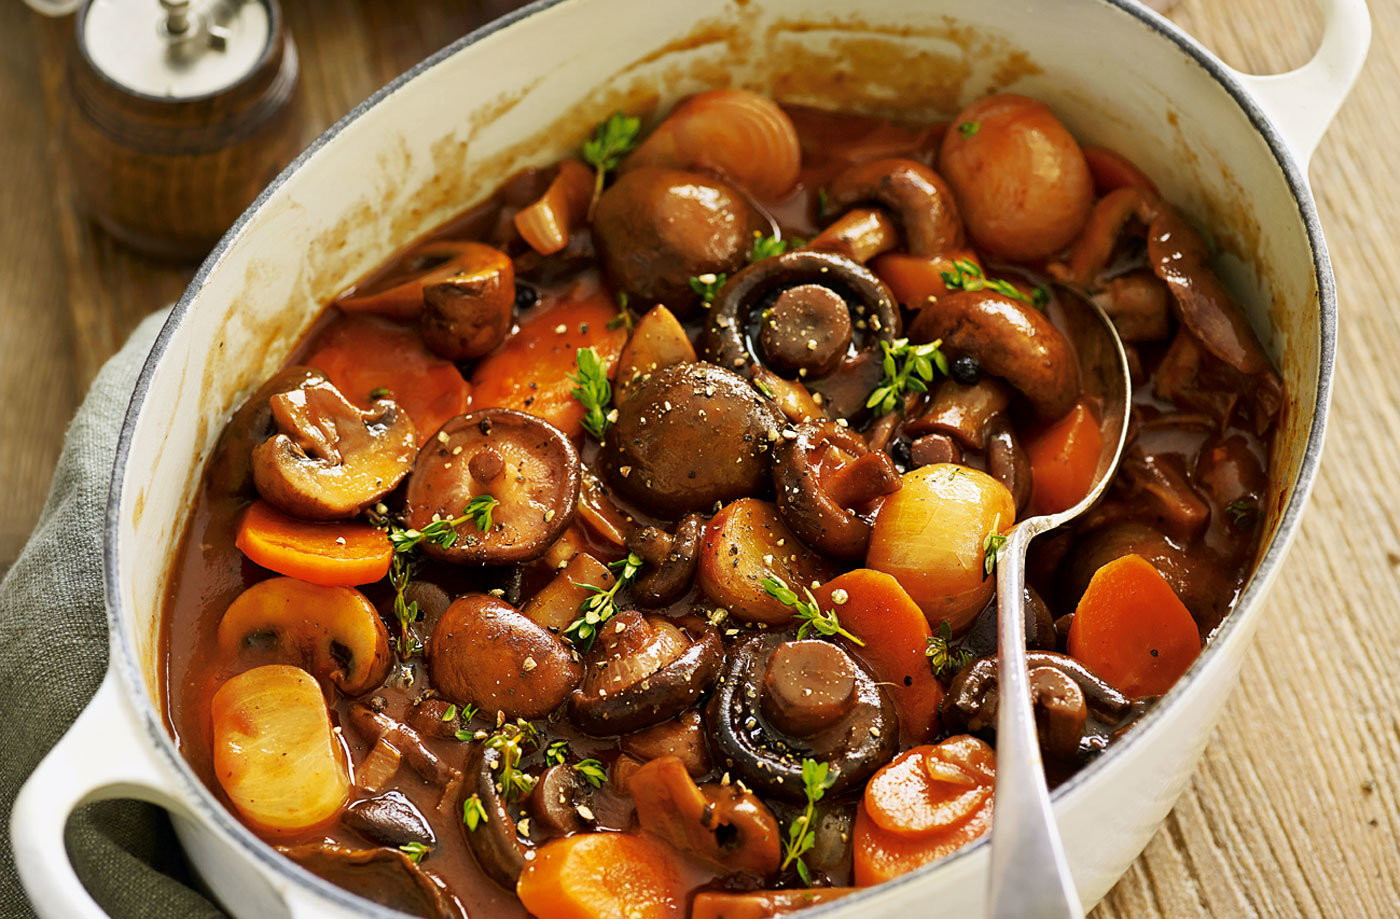 Mushroom Recipes Vegetarian  Mushroom bourguignon